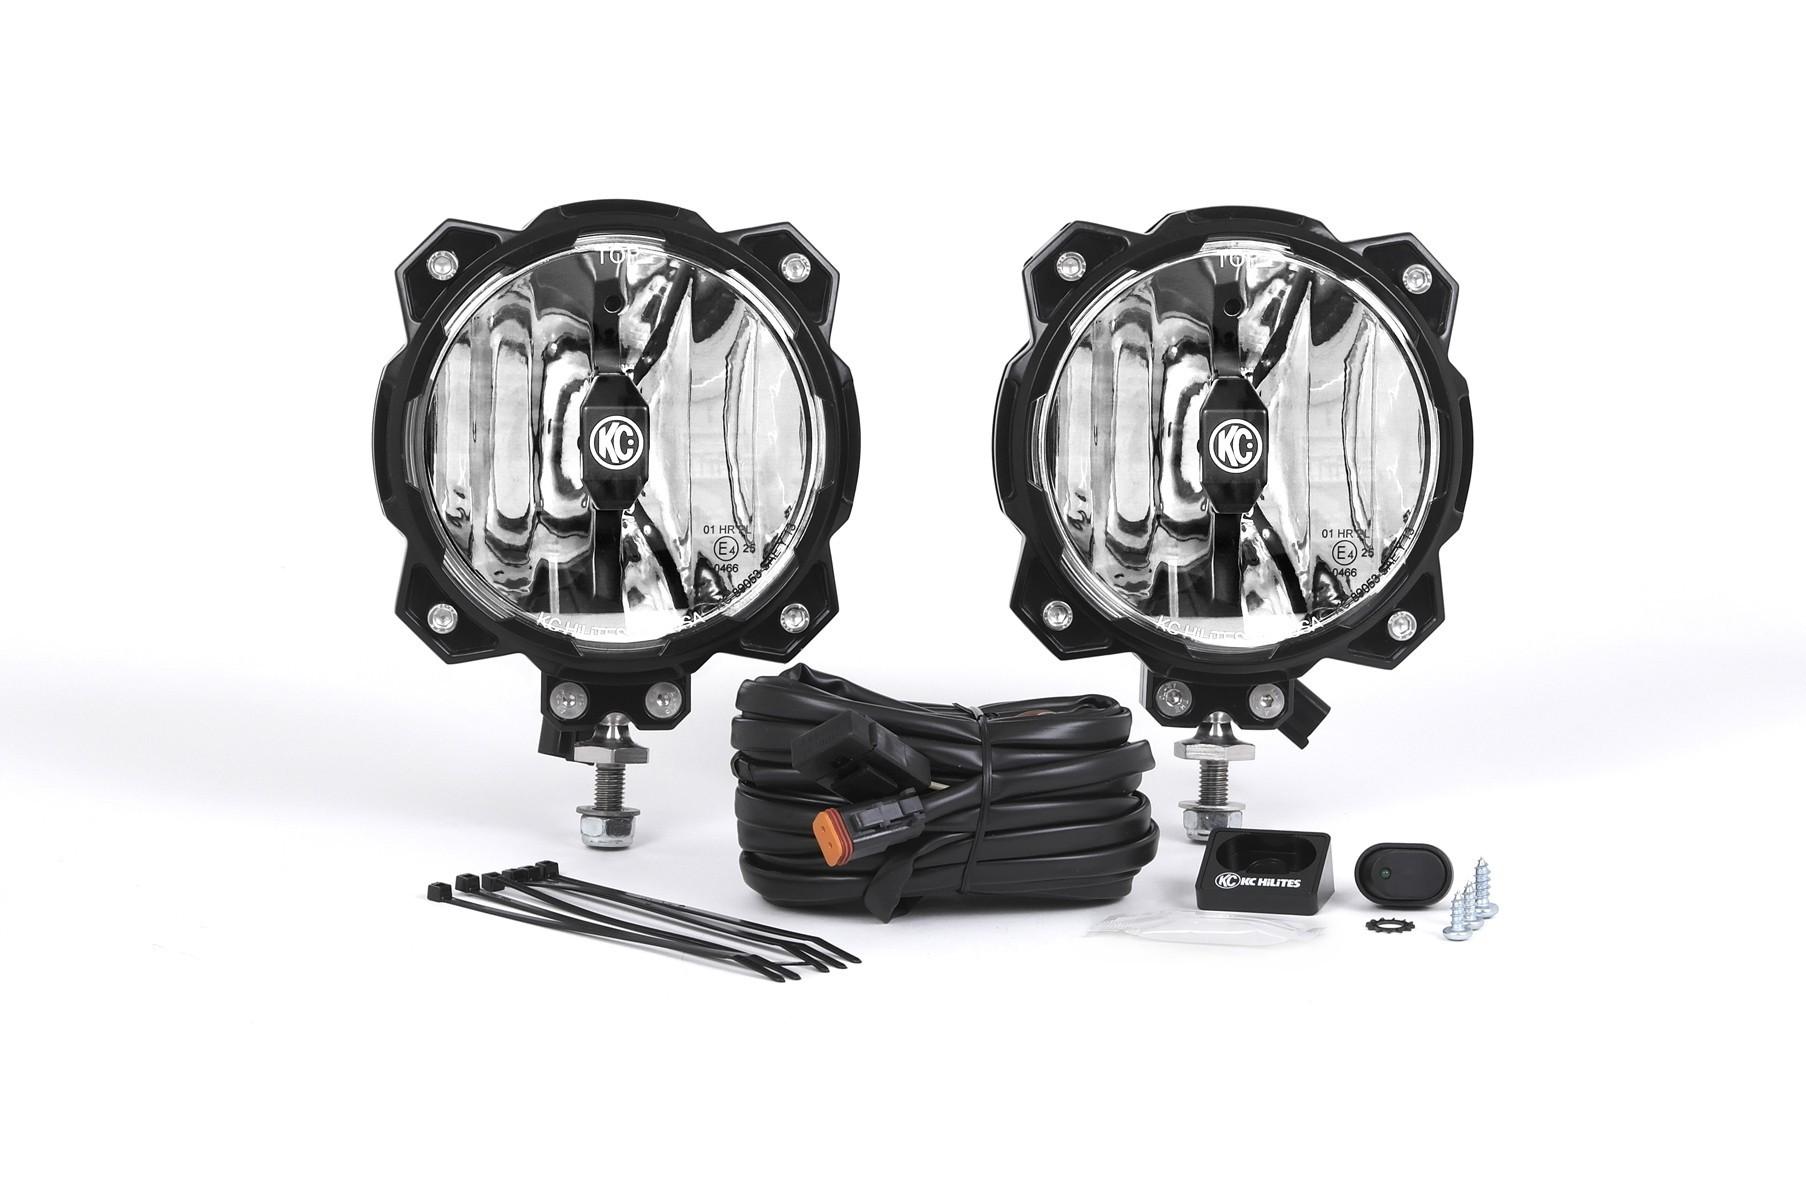 KC HiLiTES Gravity LED PRO6 pair pack system